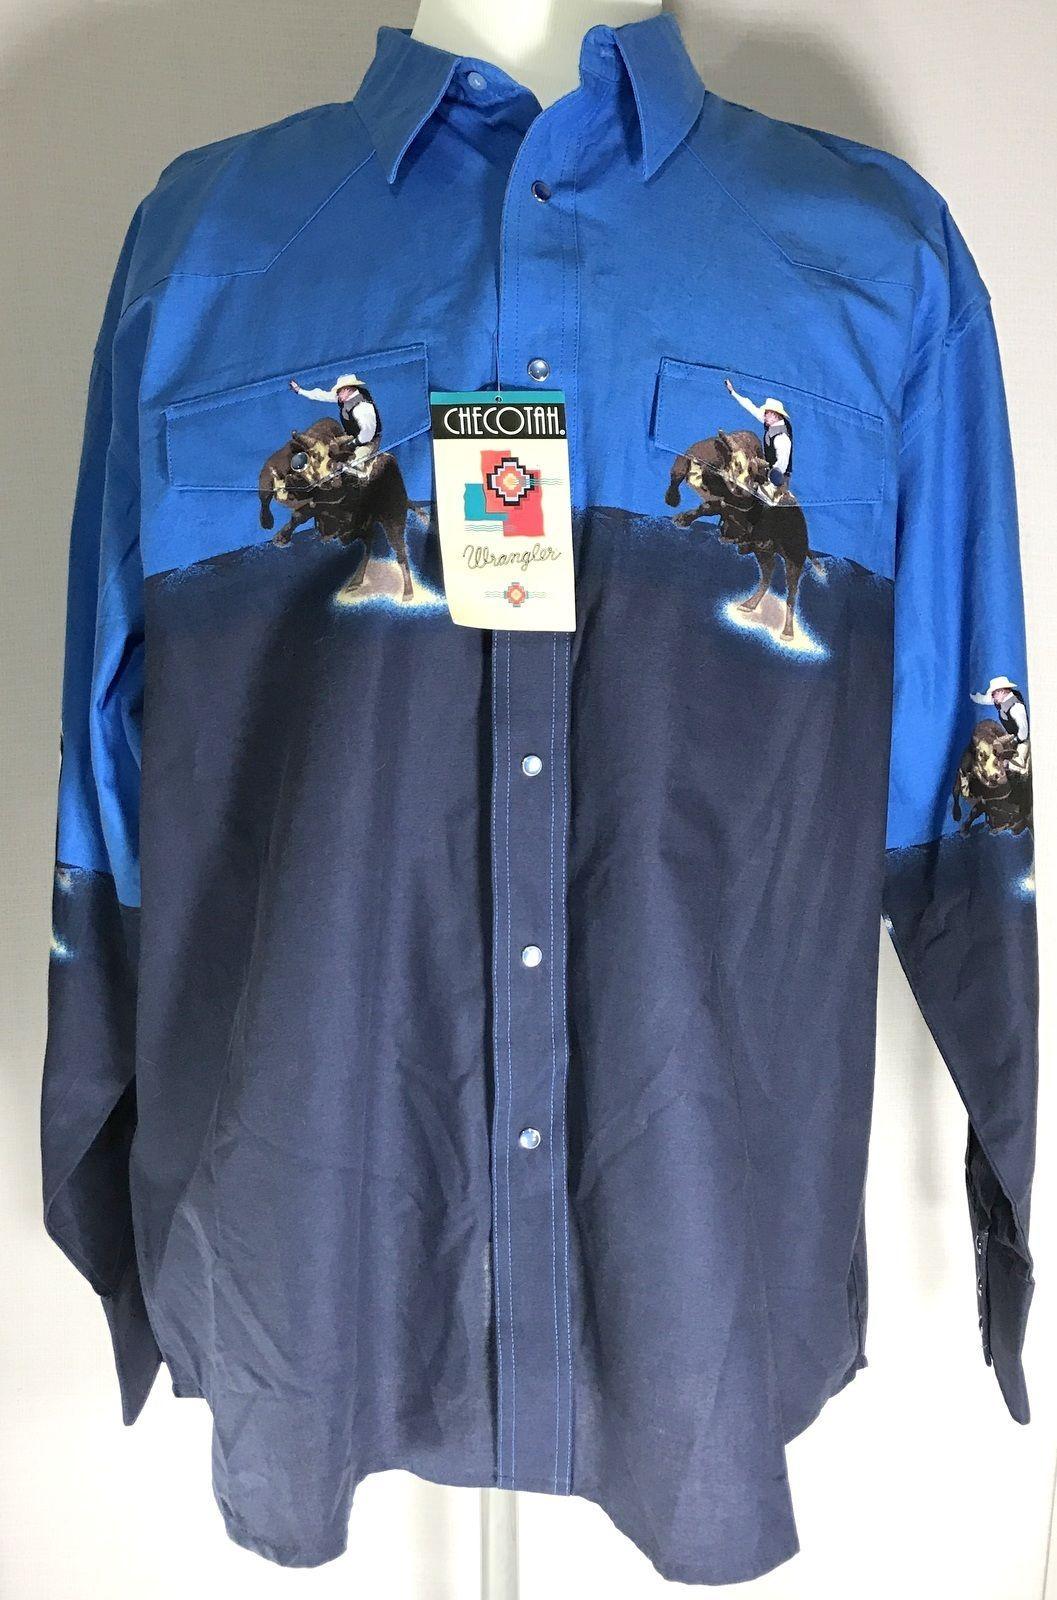 73475db1 Wrangler Checotah Western Shirt Mens Size and 50 similar items. S l1600